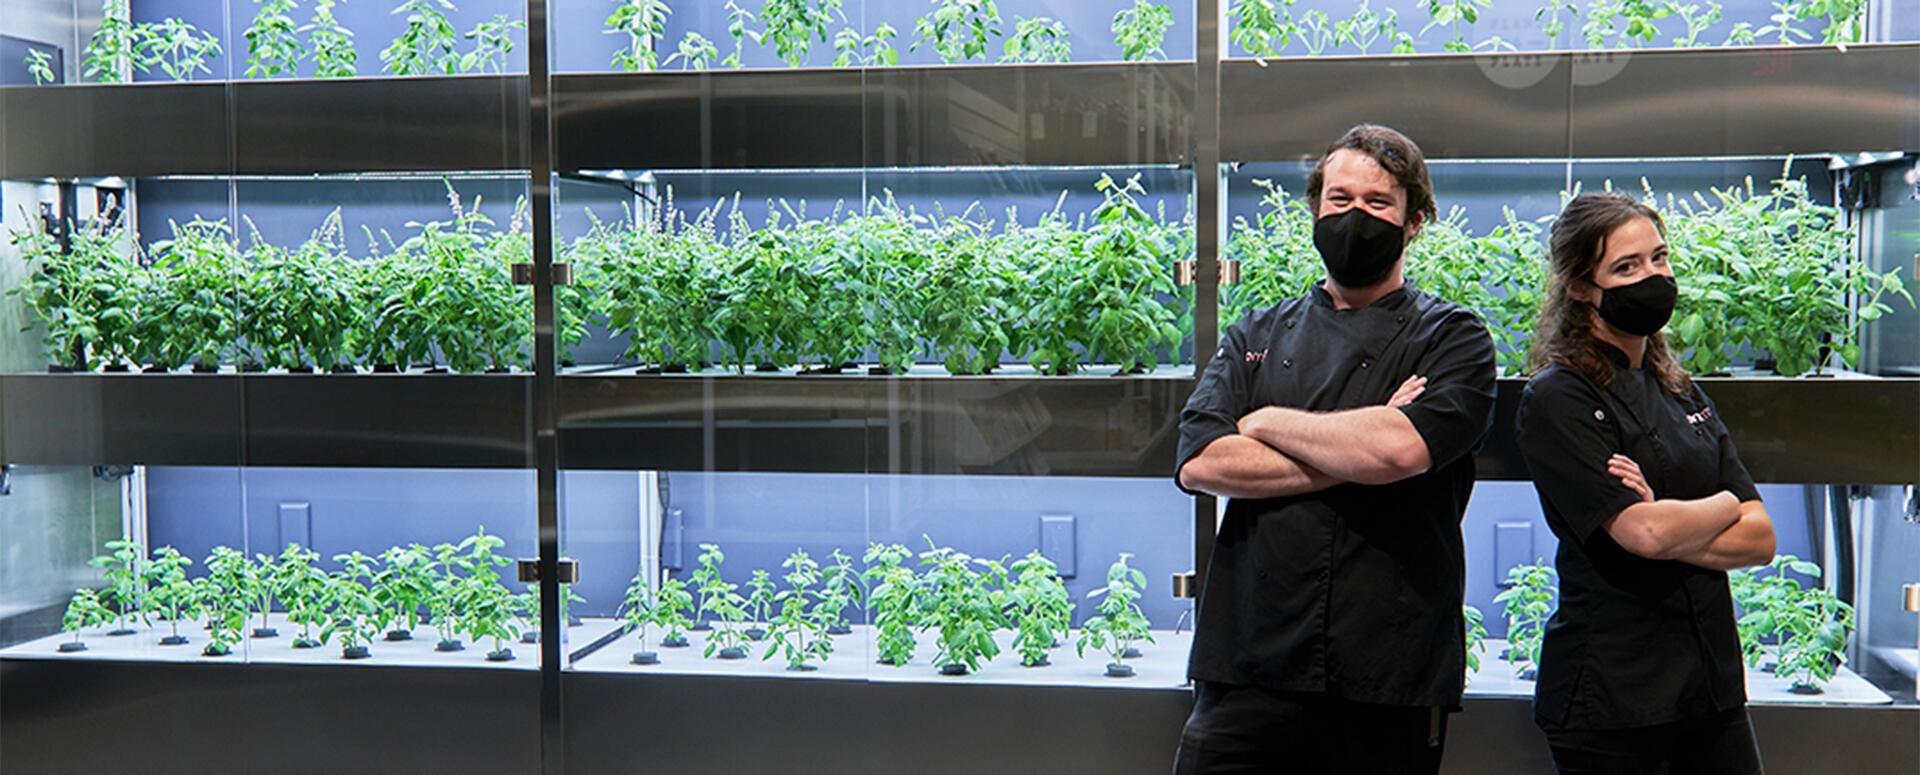 Fresh greens hit the vertical shelvesat Whole Foods